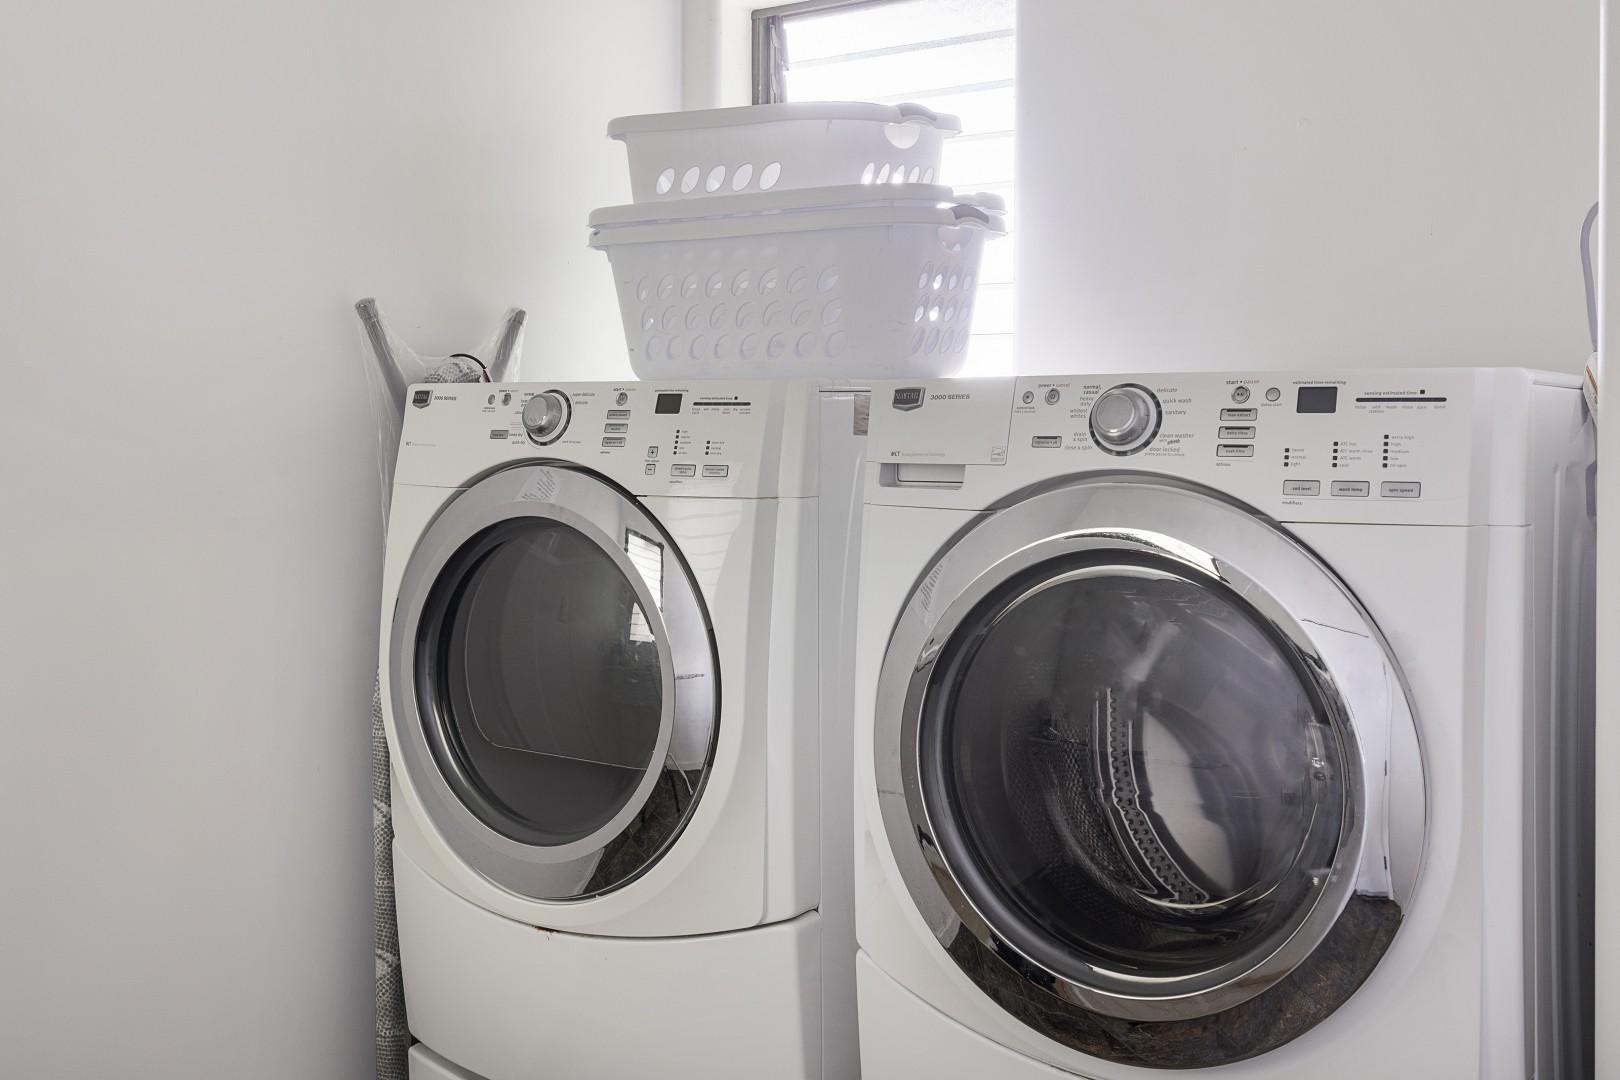 Laundry area near the garage